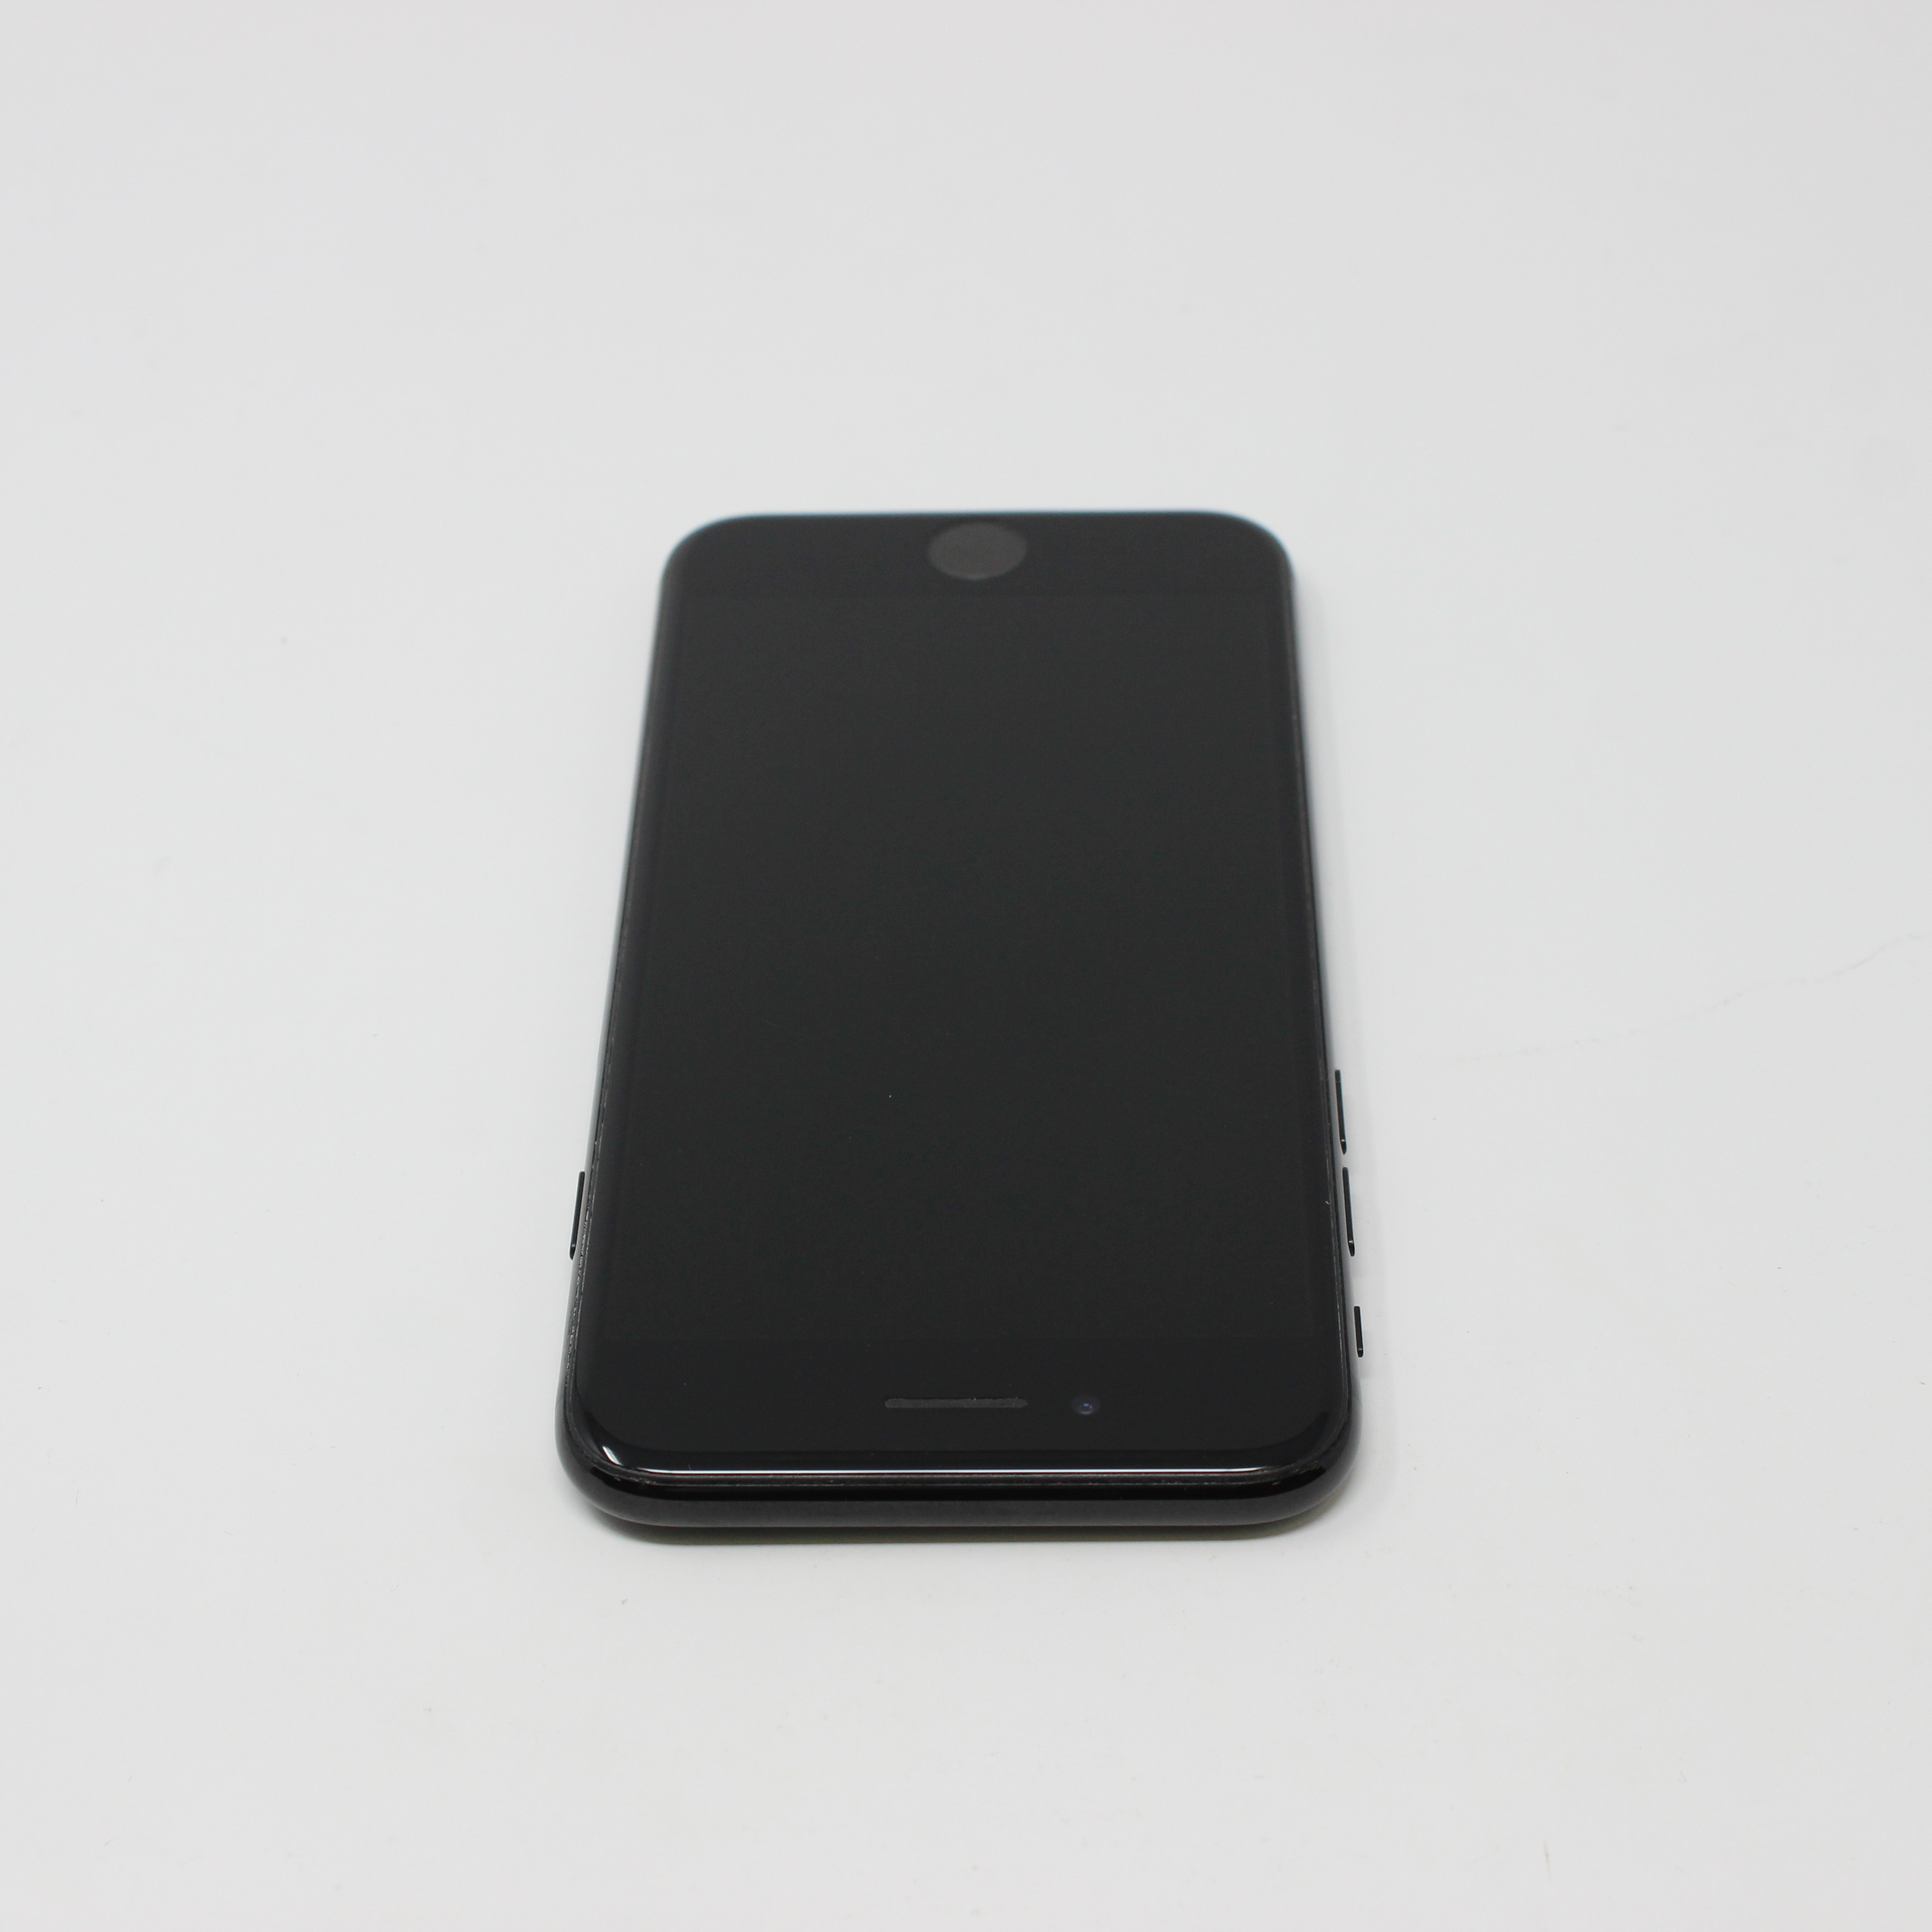 iPhone 7 32GB Black - Verizon photo 4   UpTradeit.com